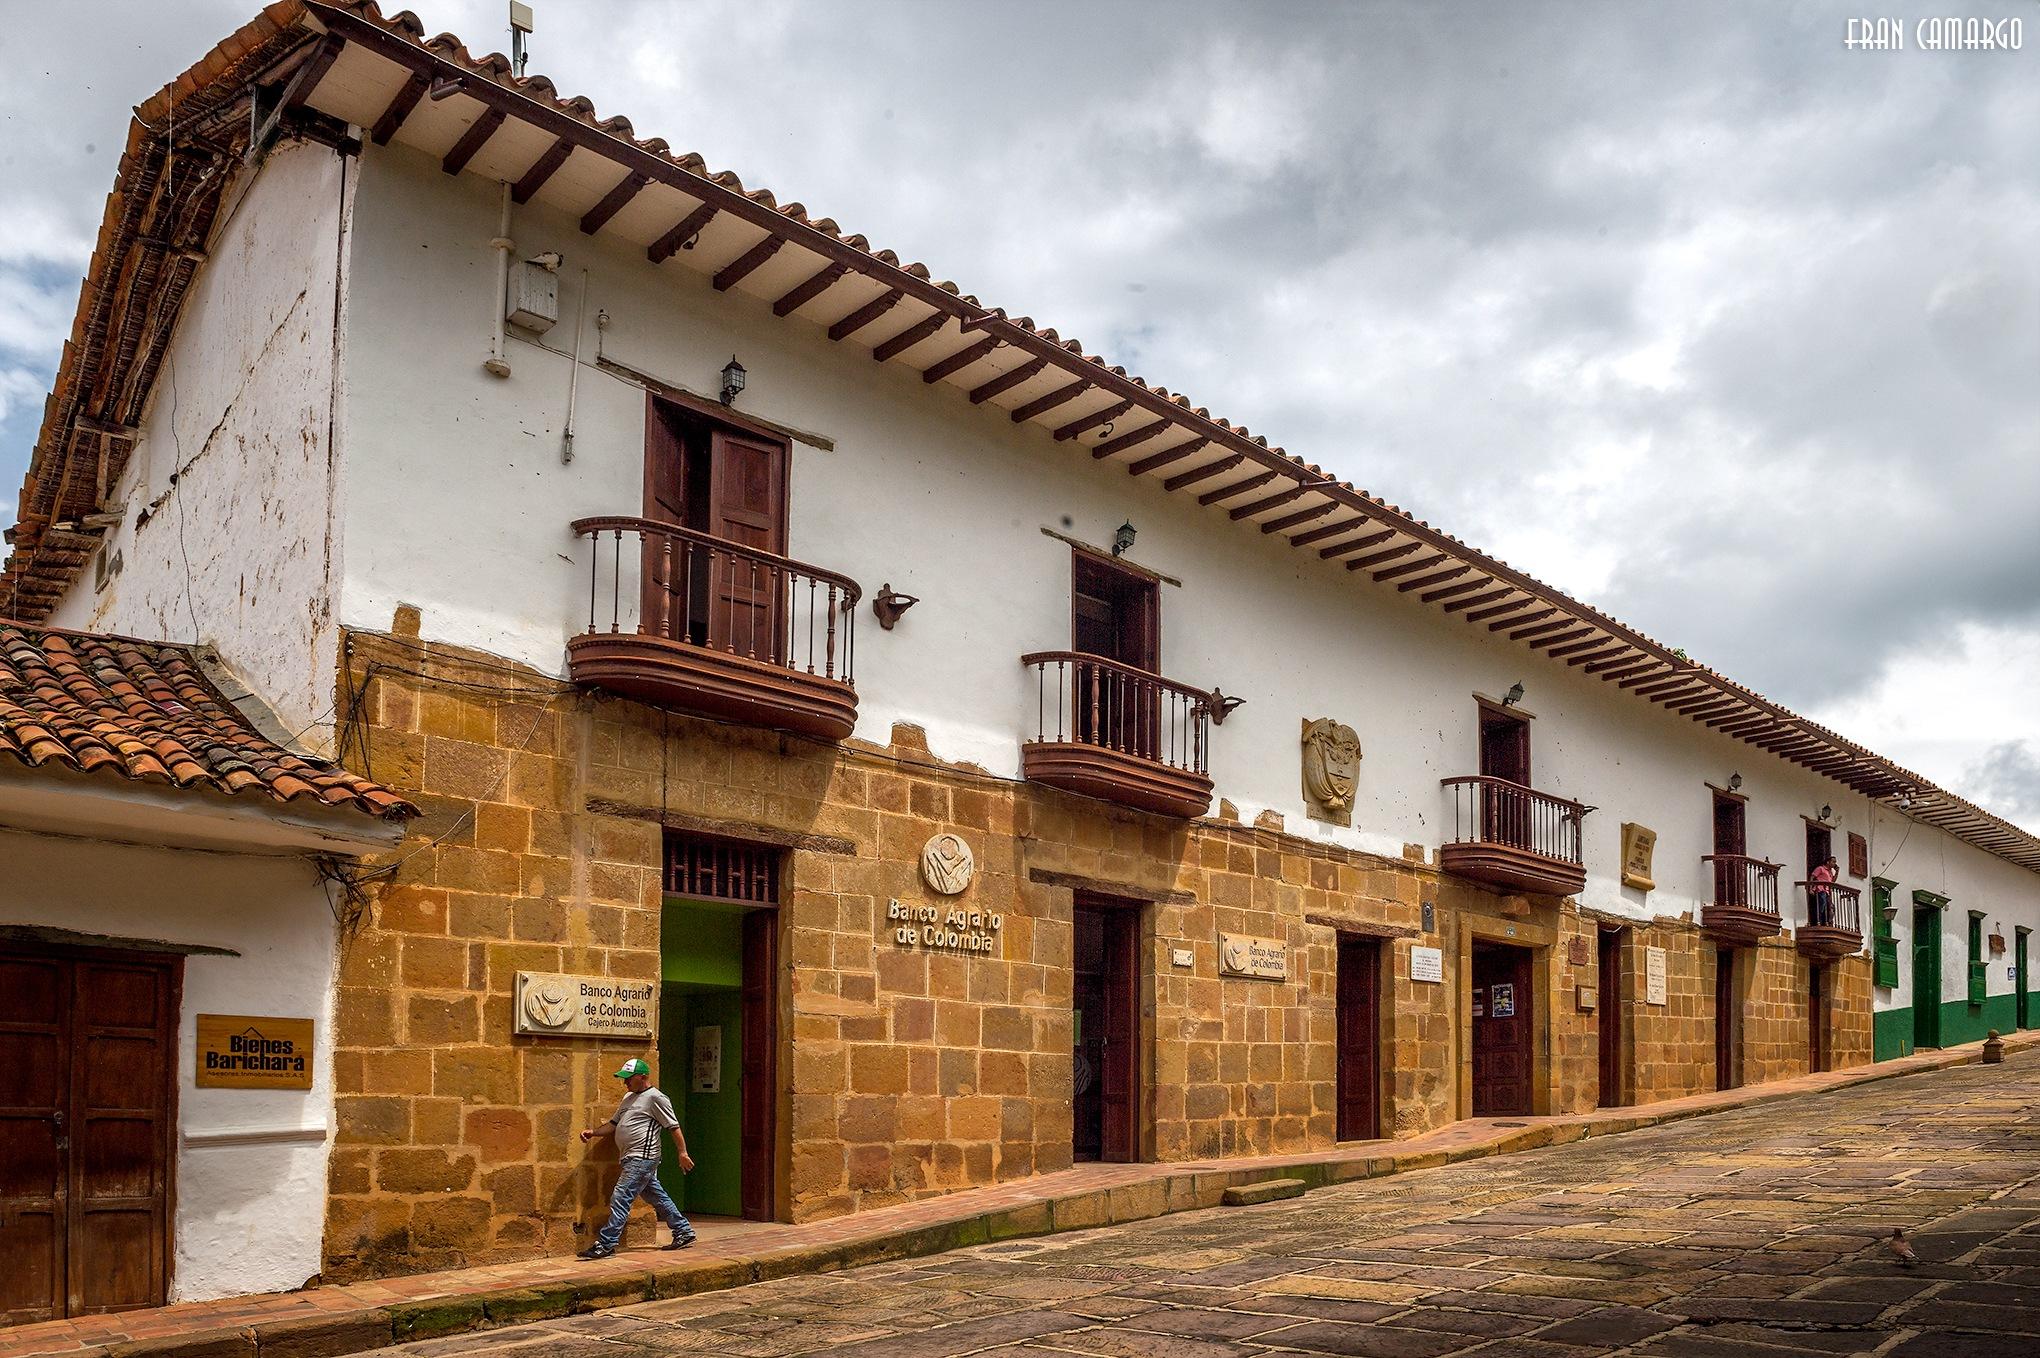 Barichara - Colombia by Fran Camargo